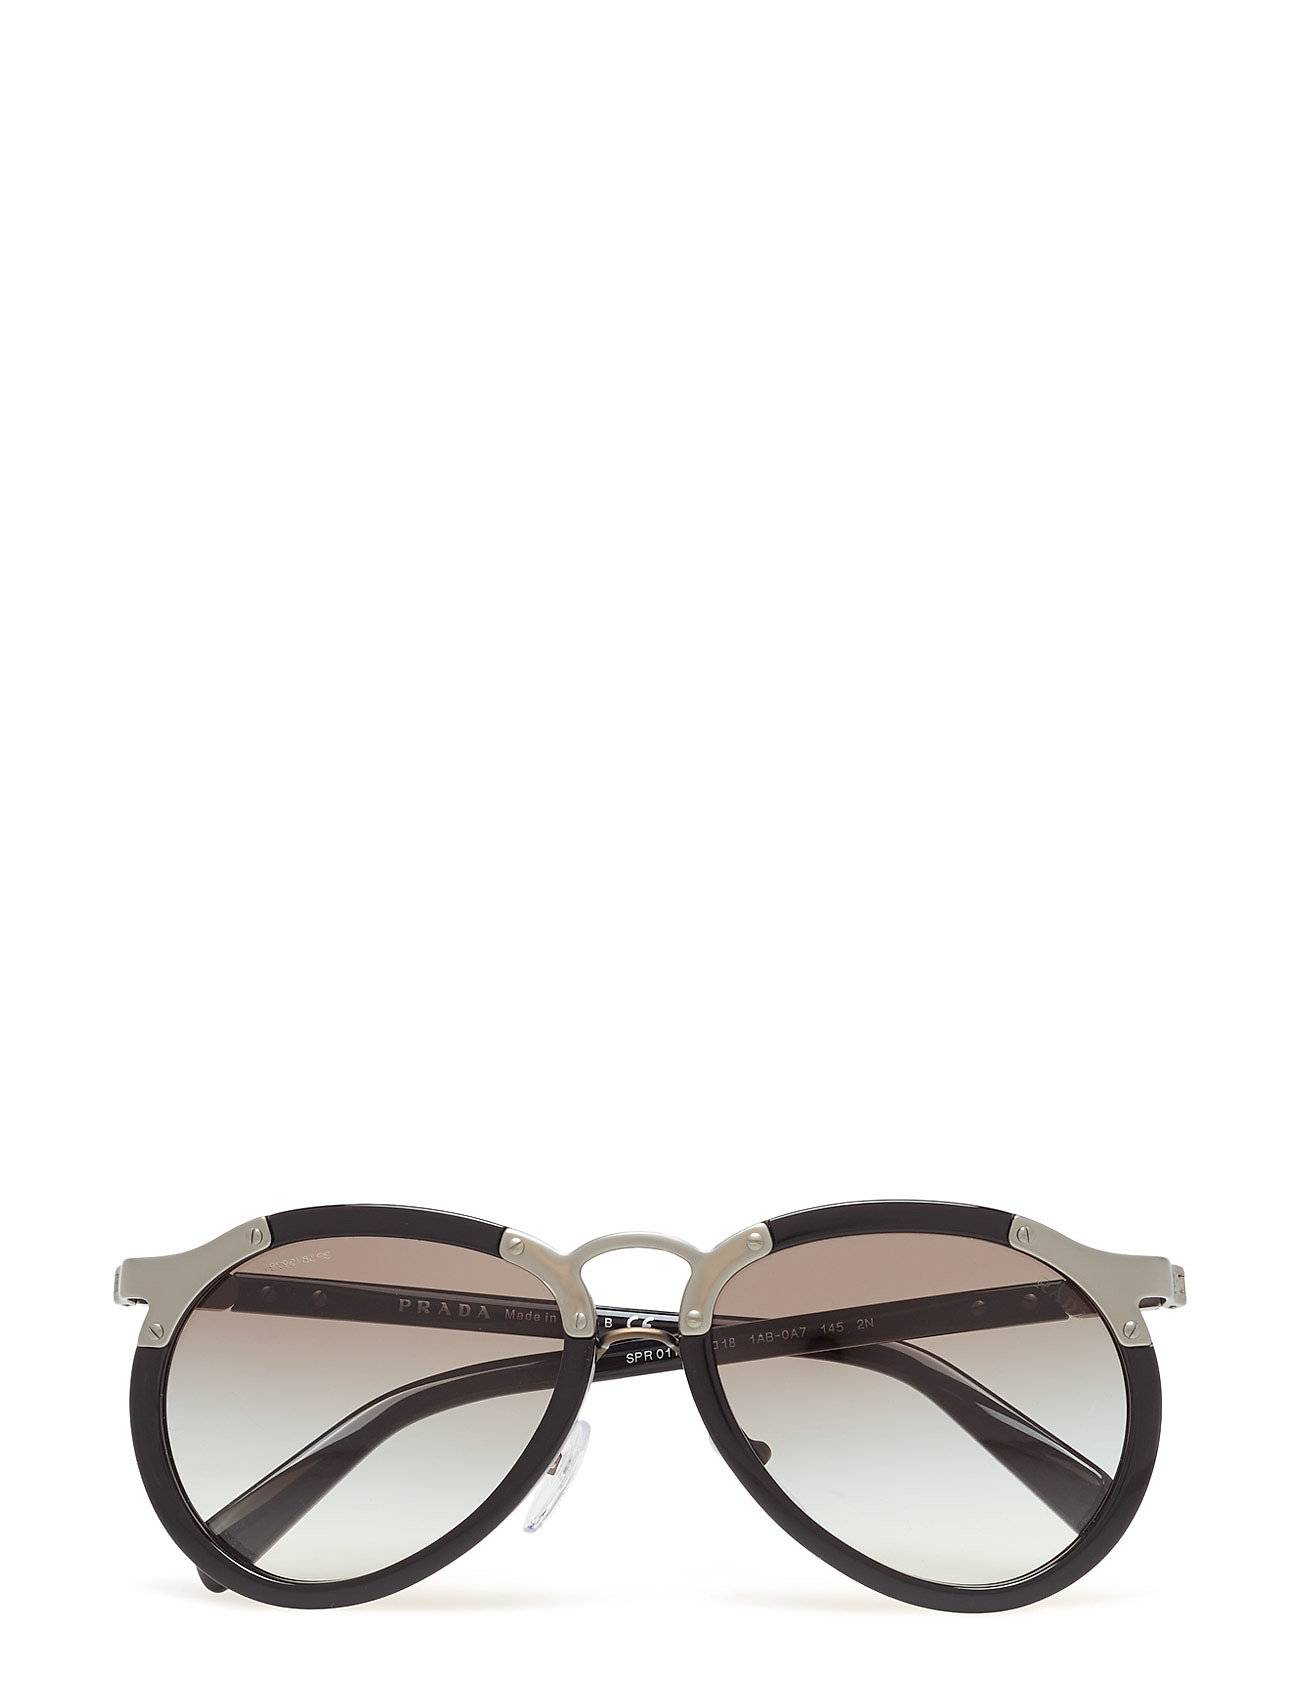 Image of Prada Sunglasses Catwalk Pilottilasit Aurinkolasit Musta